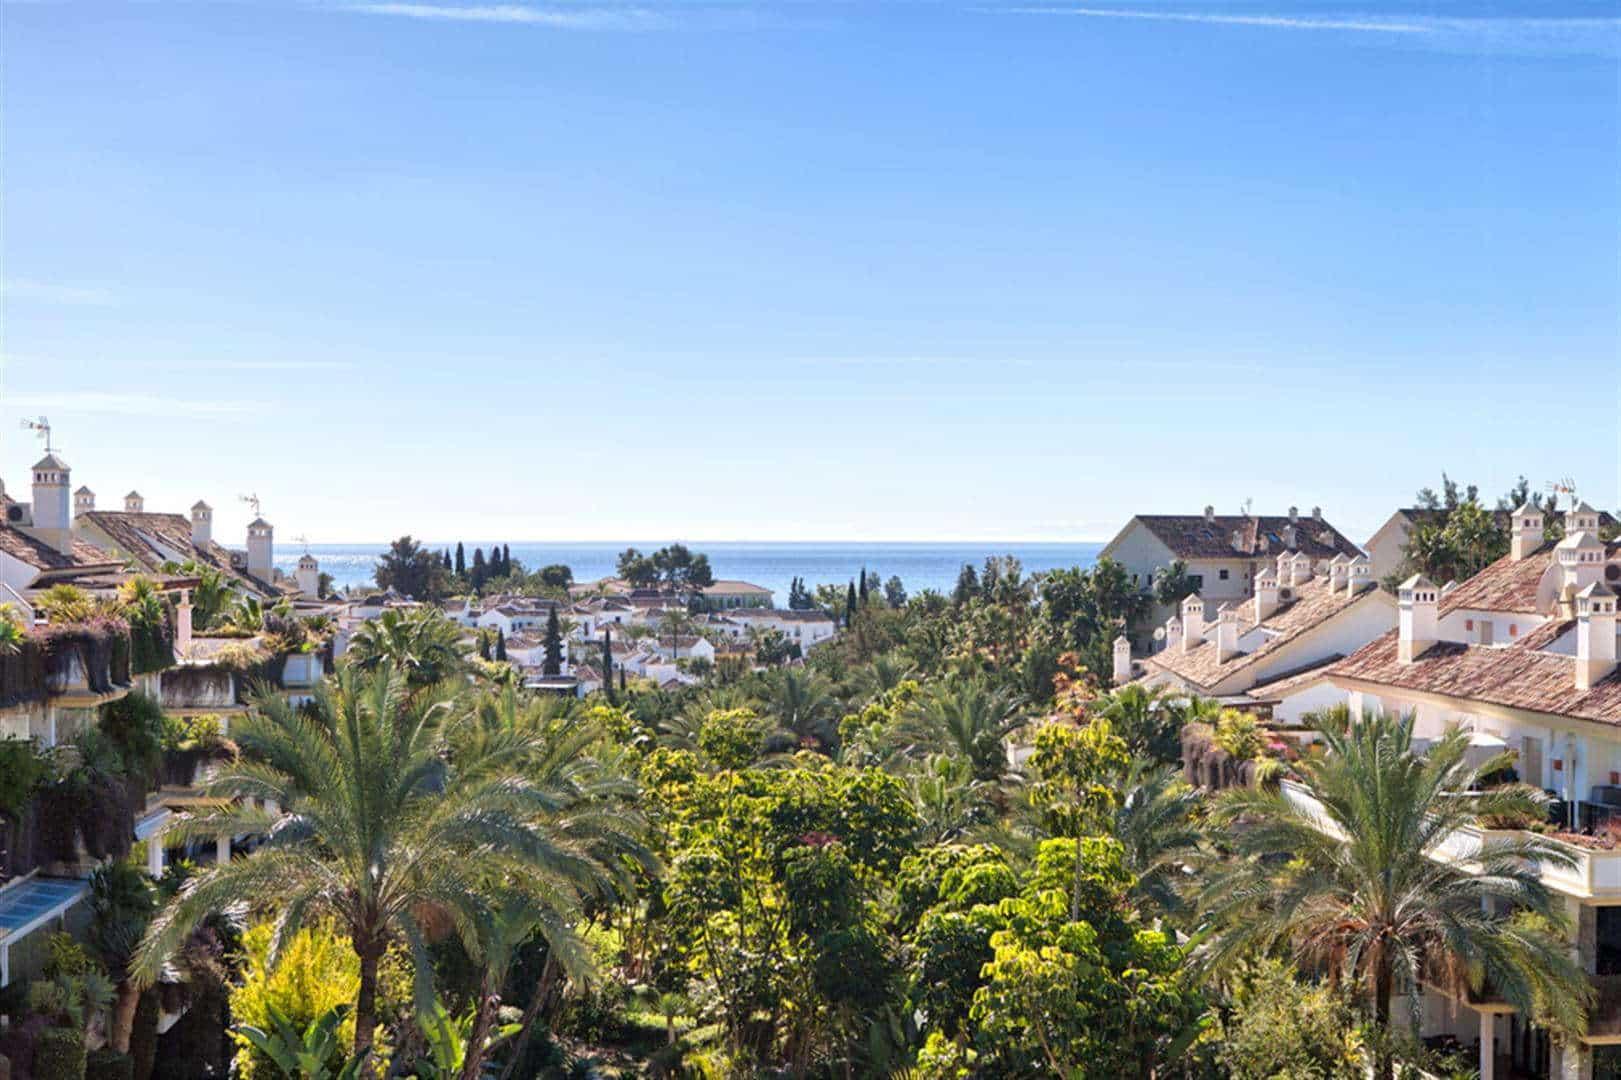 Sea view Penthouse in Lomas del Rey Golden Mile Marbella near Puente Romano and Marbella Club hotels